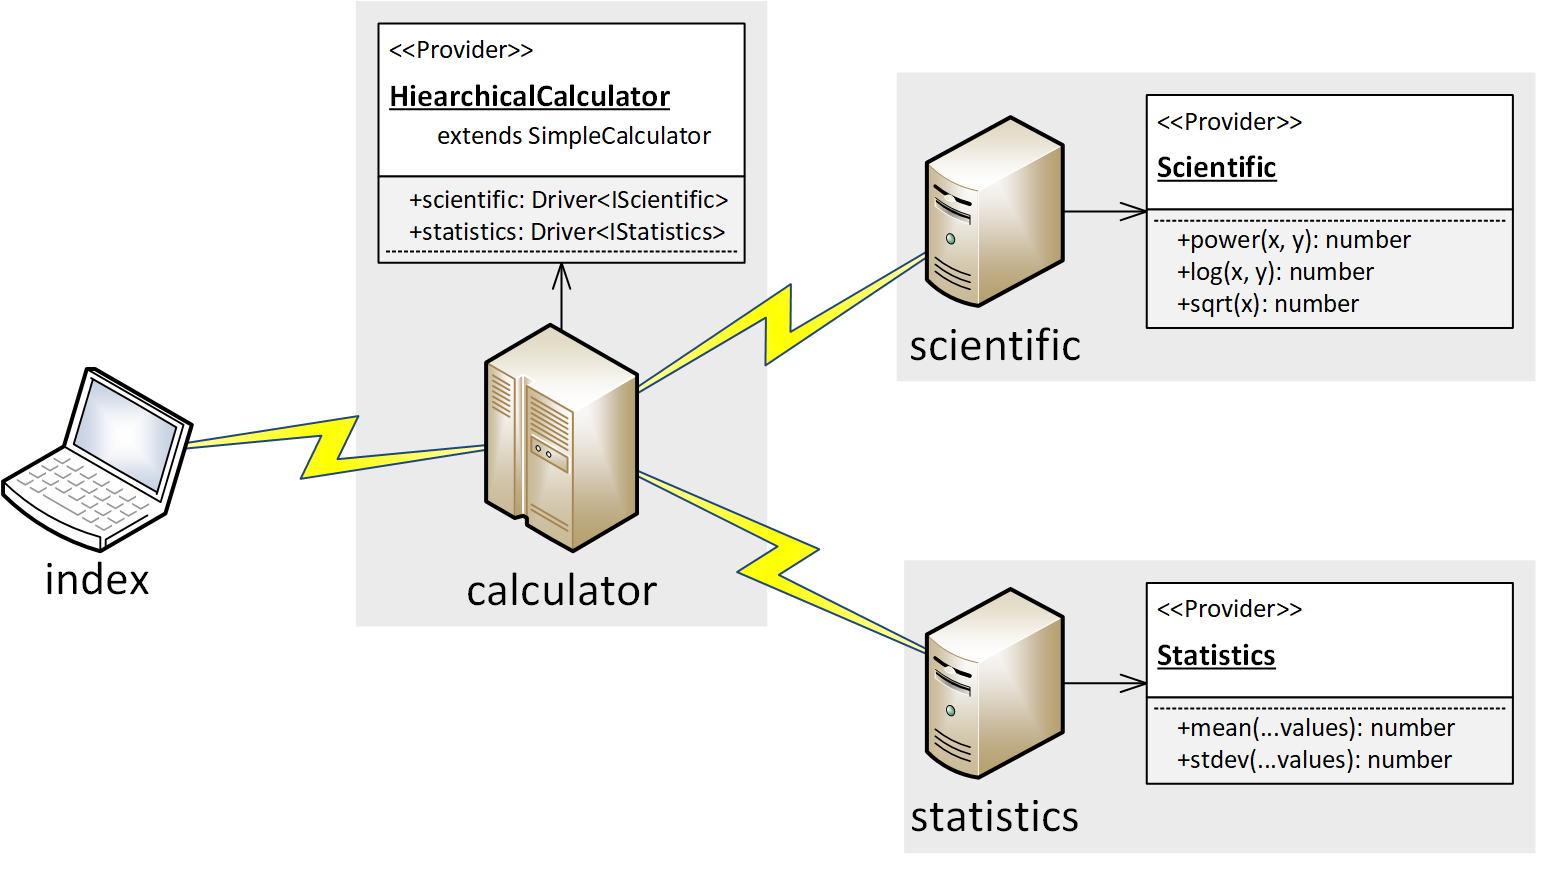 Diagram of Hierarchical Calculator